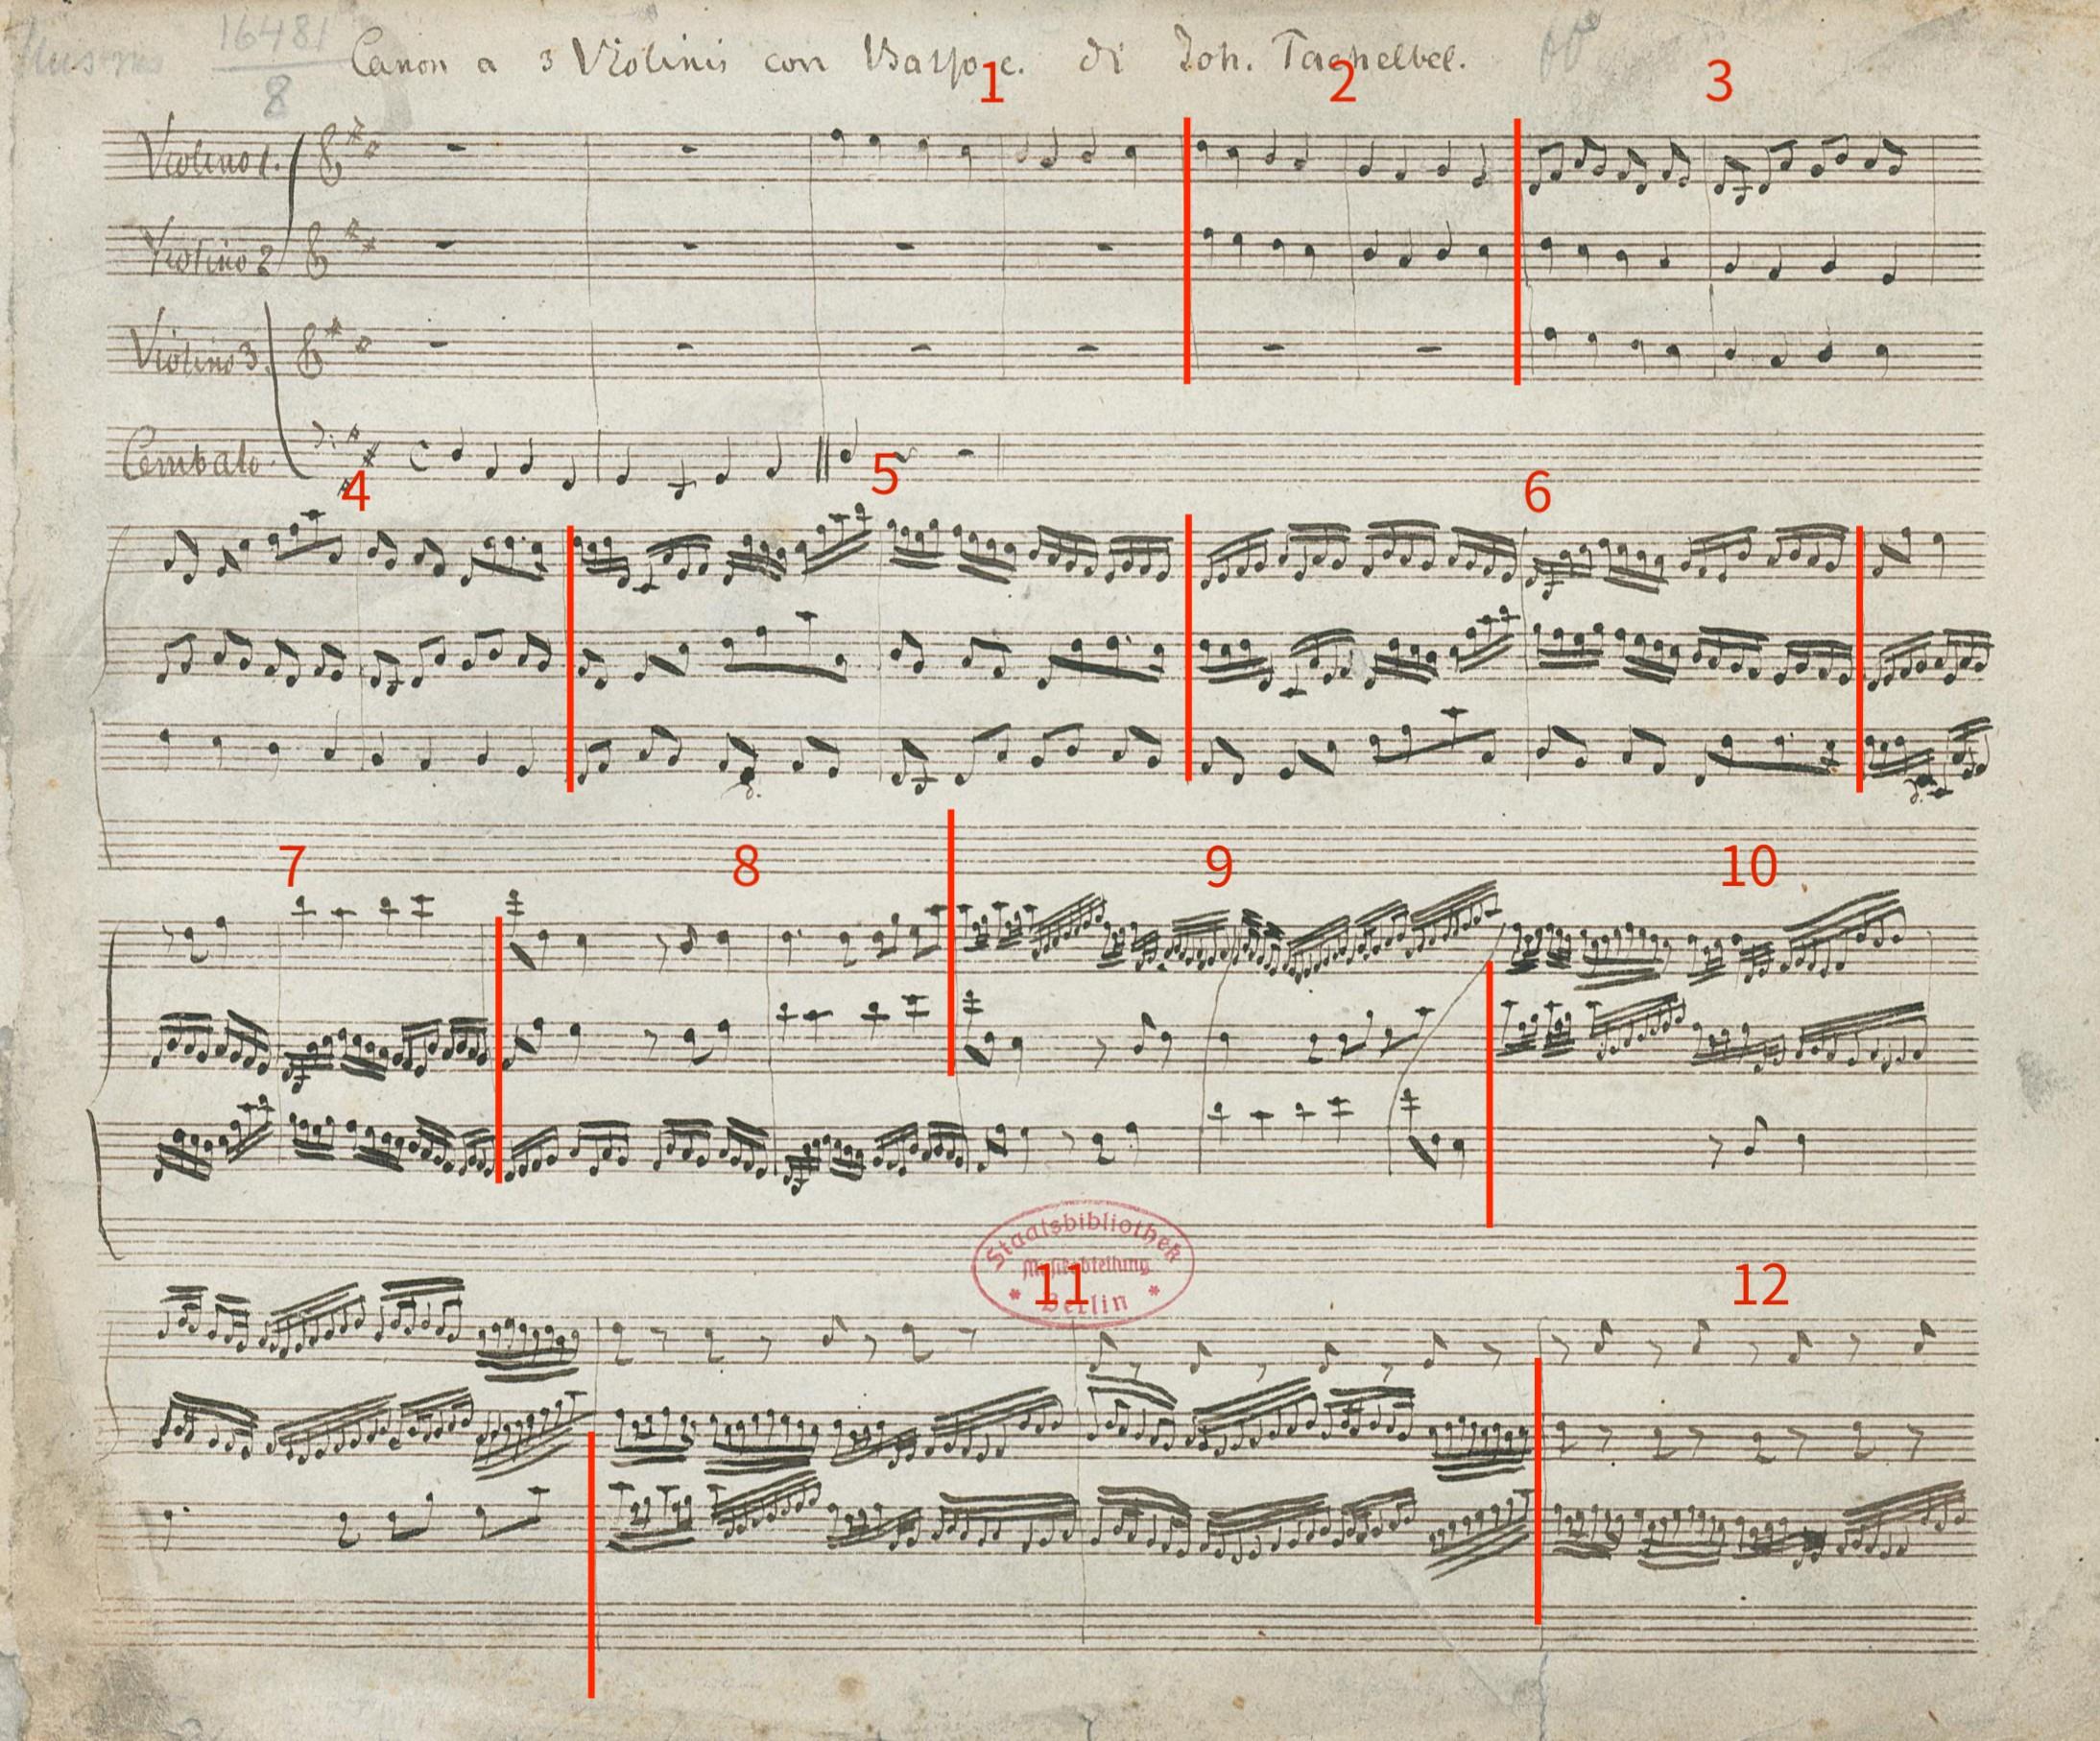 Bach's manuscript